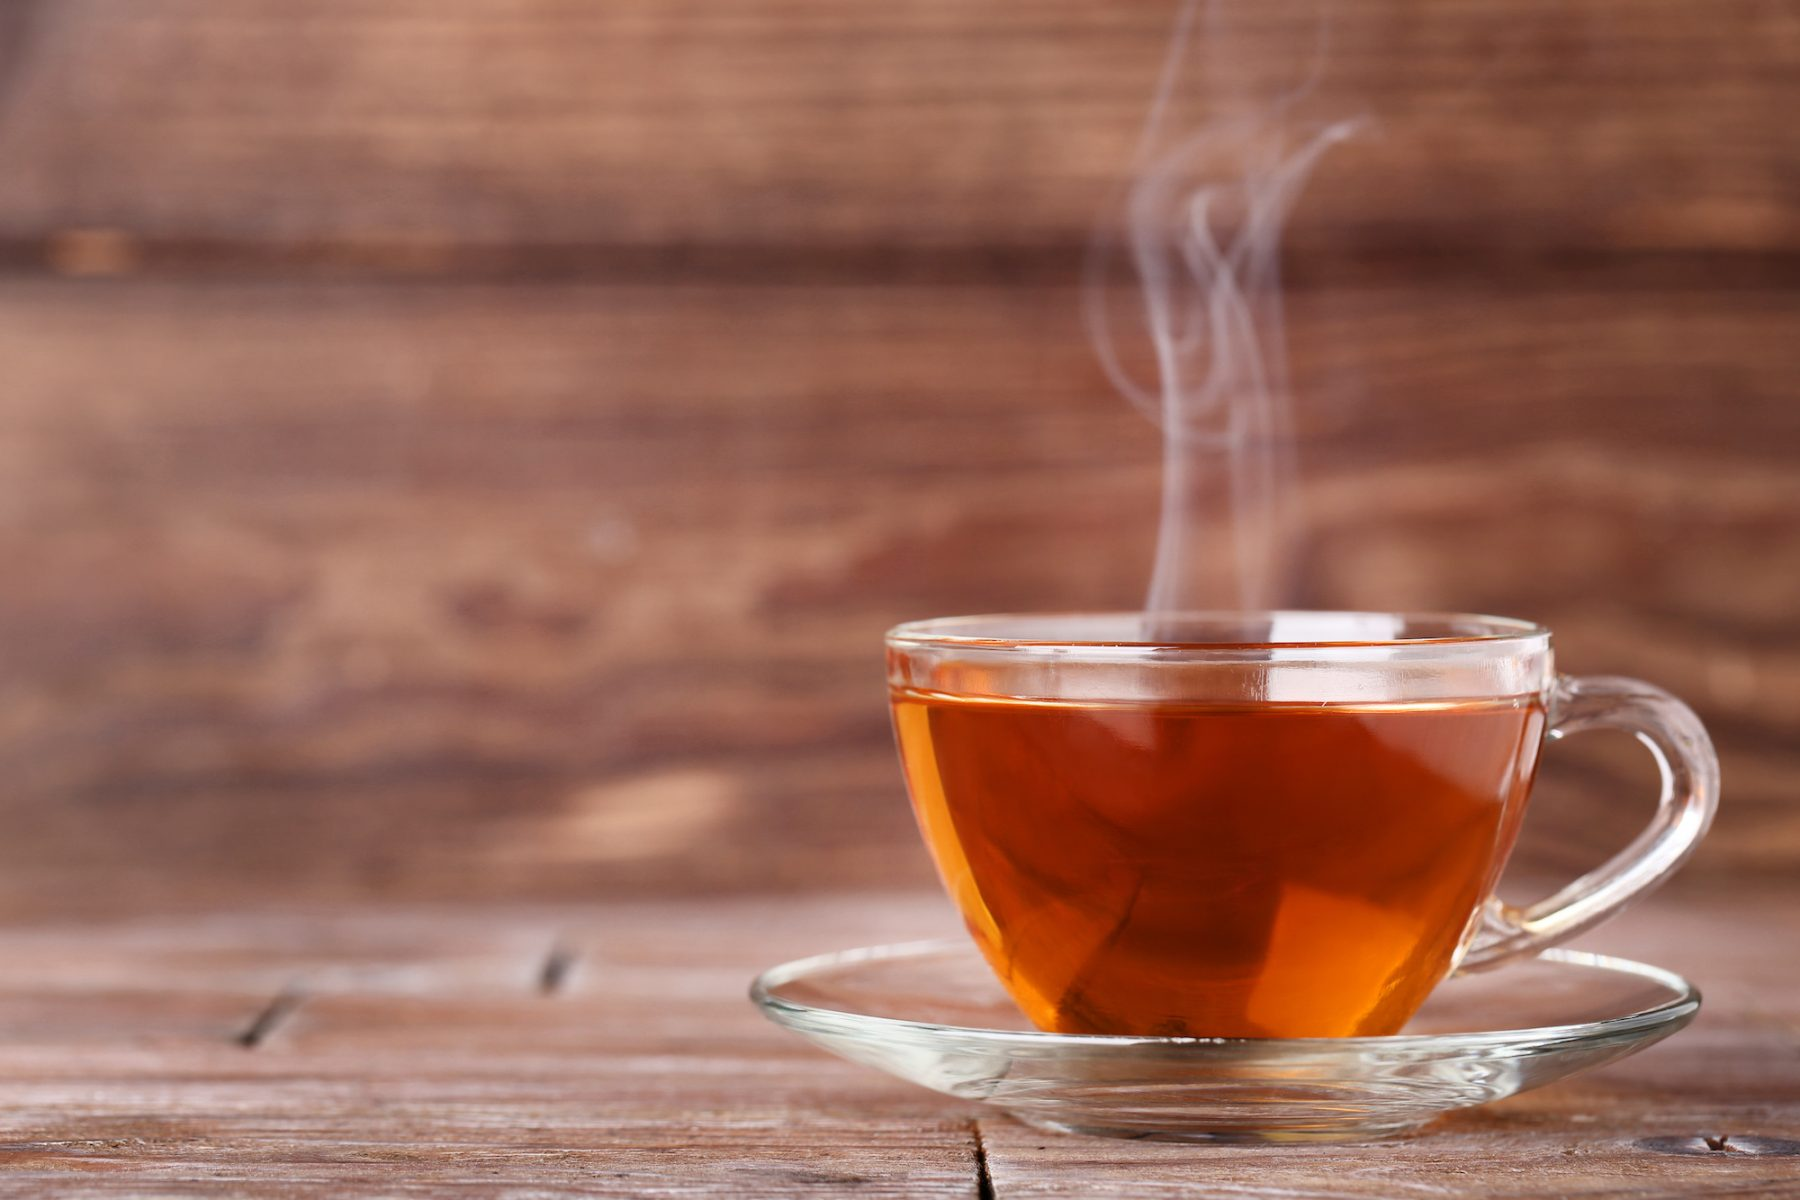 Tazo tea from Starbucks in Minneapolis and St. Paul